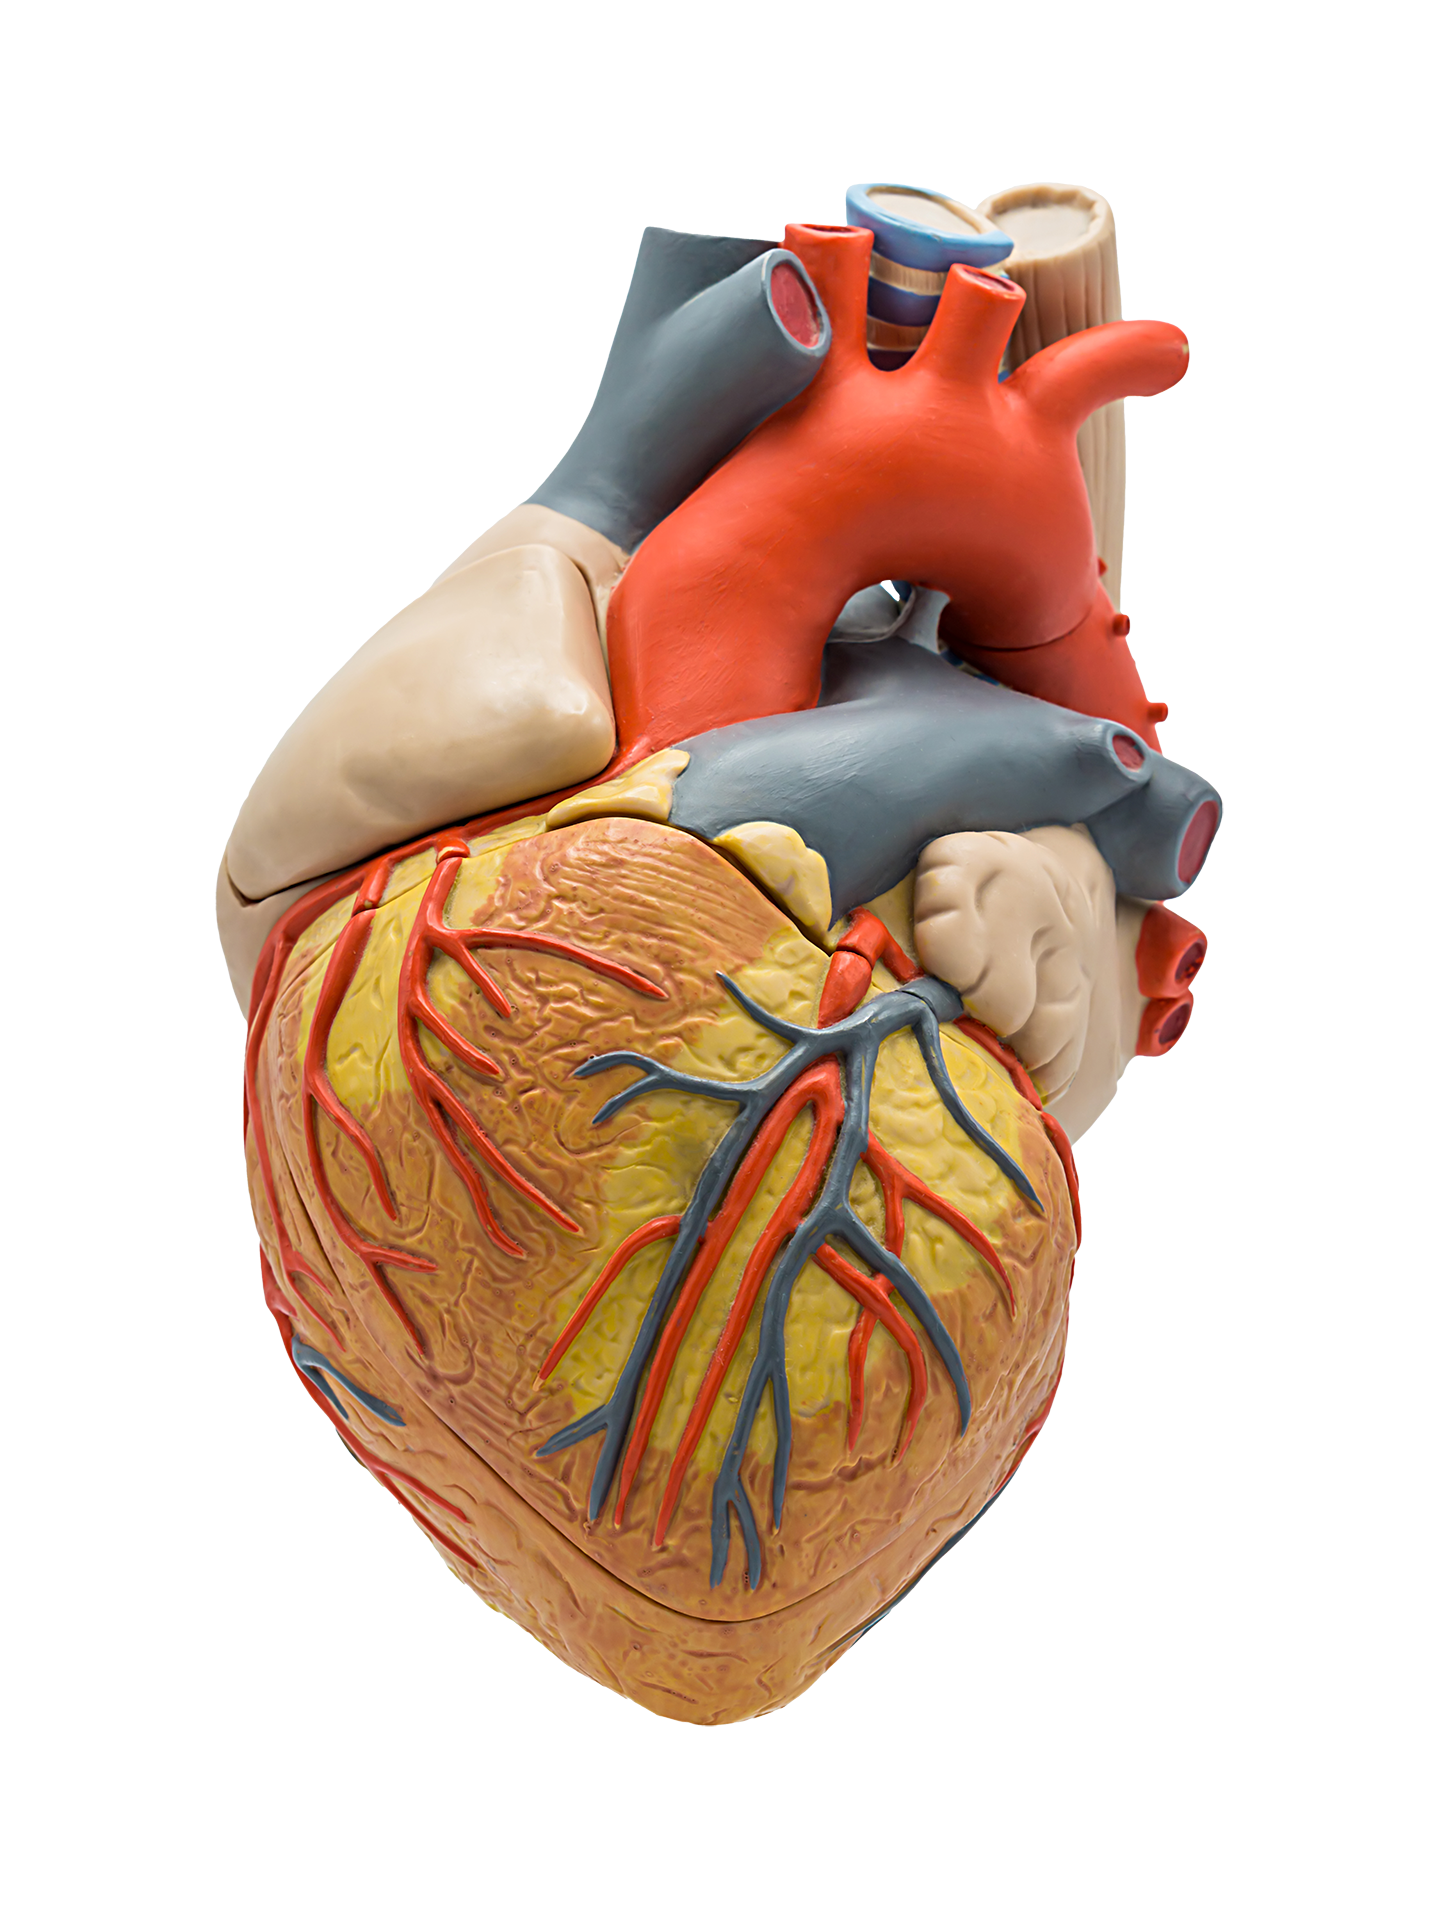 Herzchirurgie Schweiz